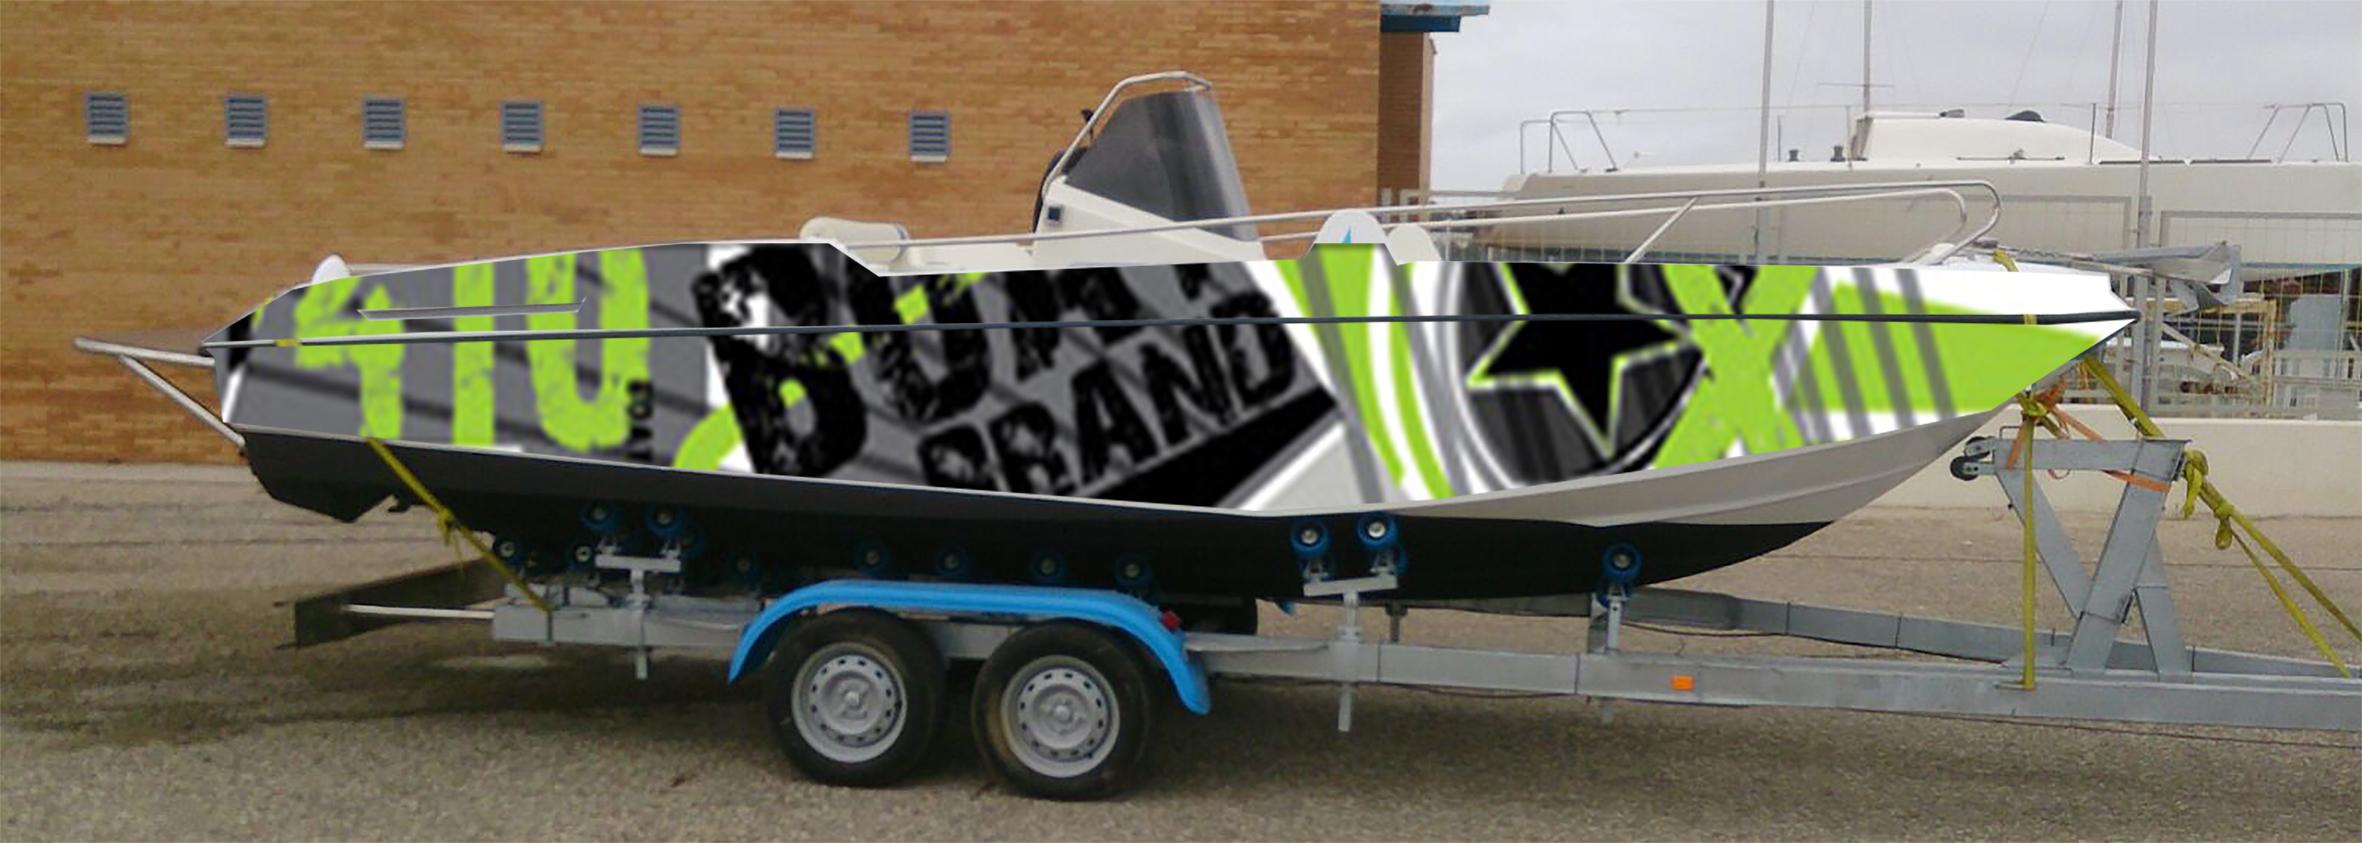 barco cadiz13